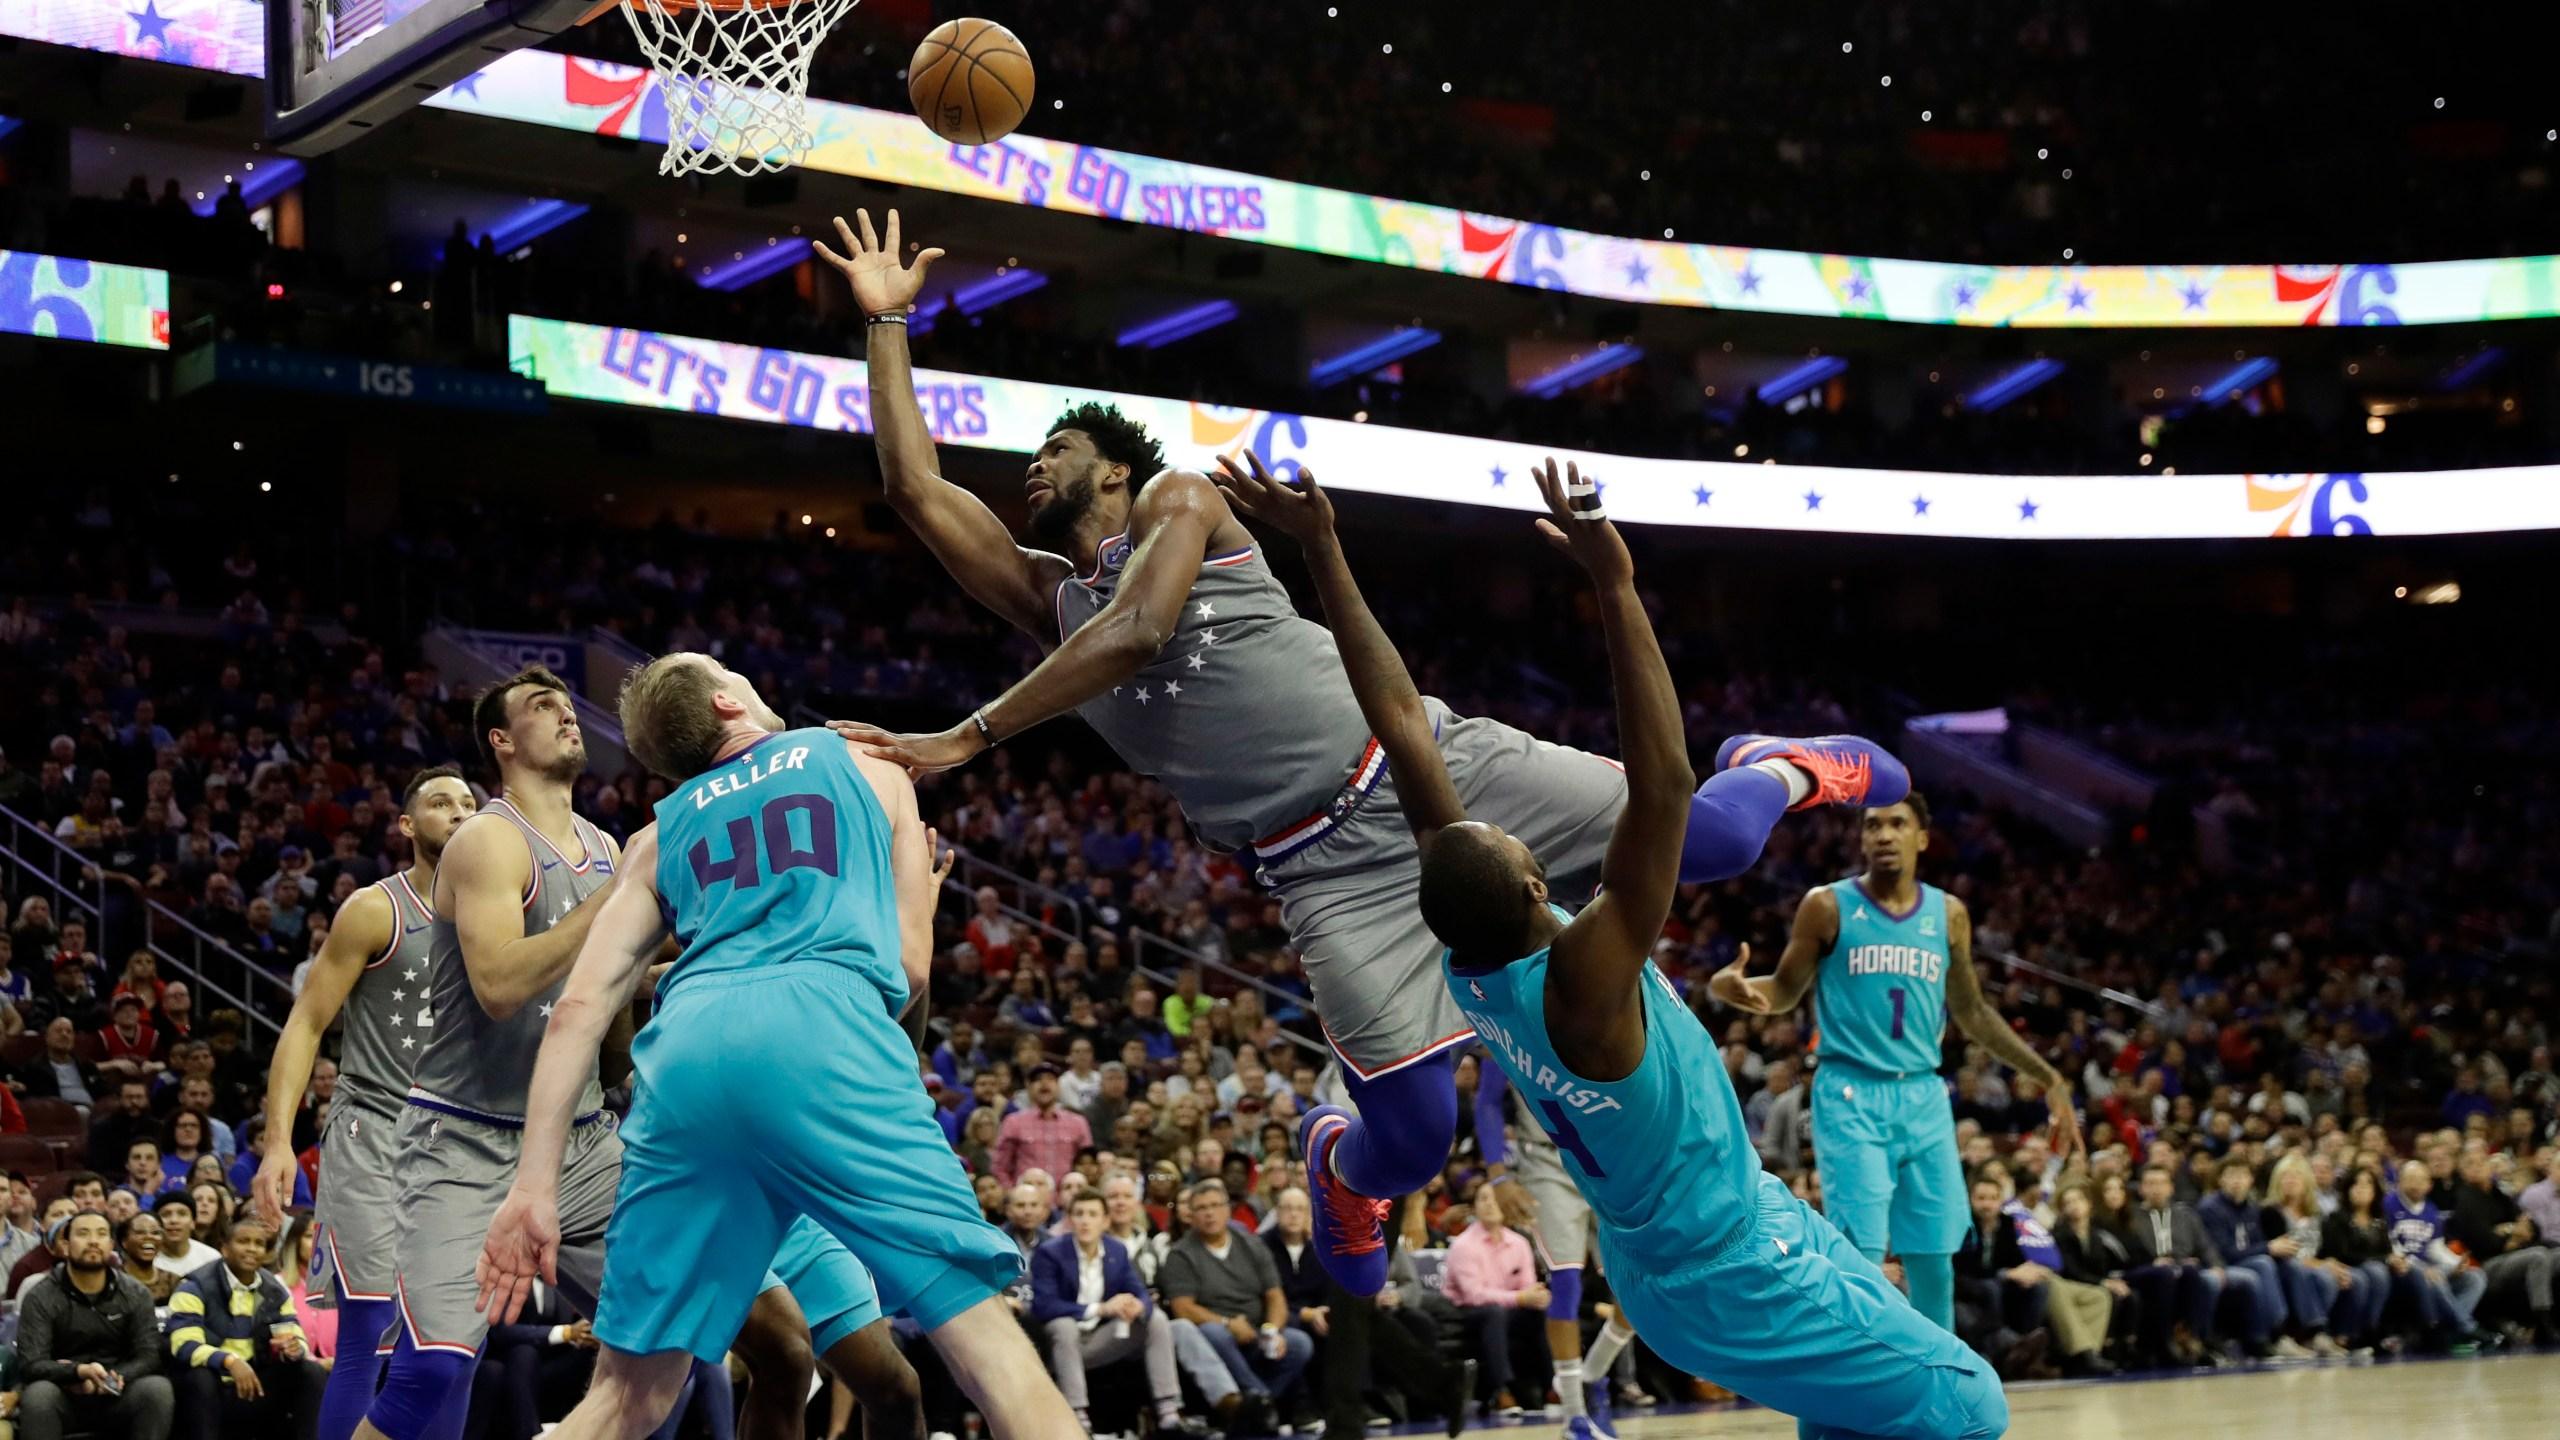 APTOPIX Hornets 76ers Basketball_1541830367959